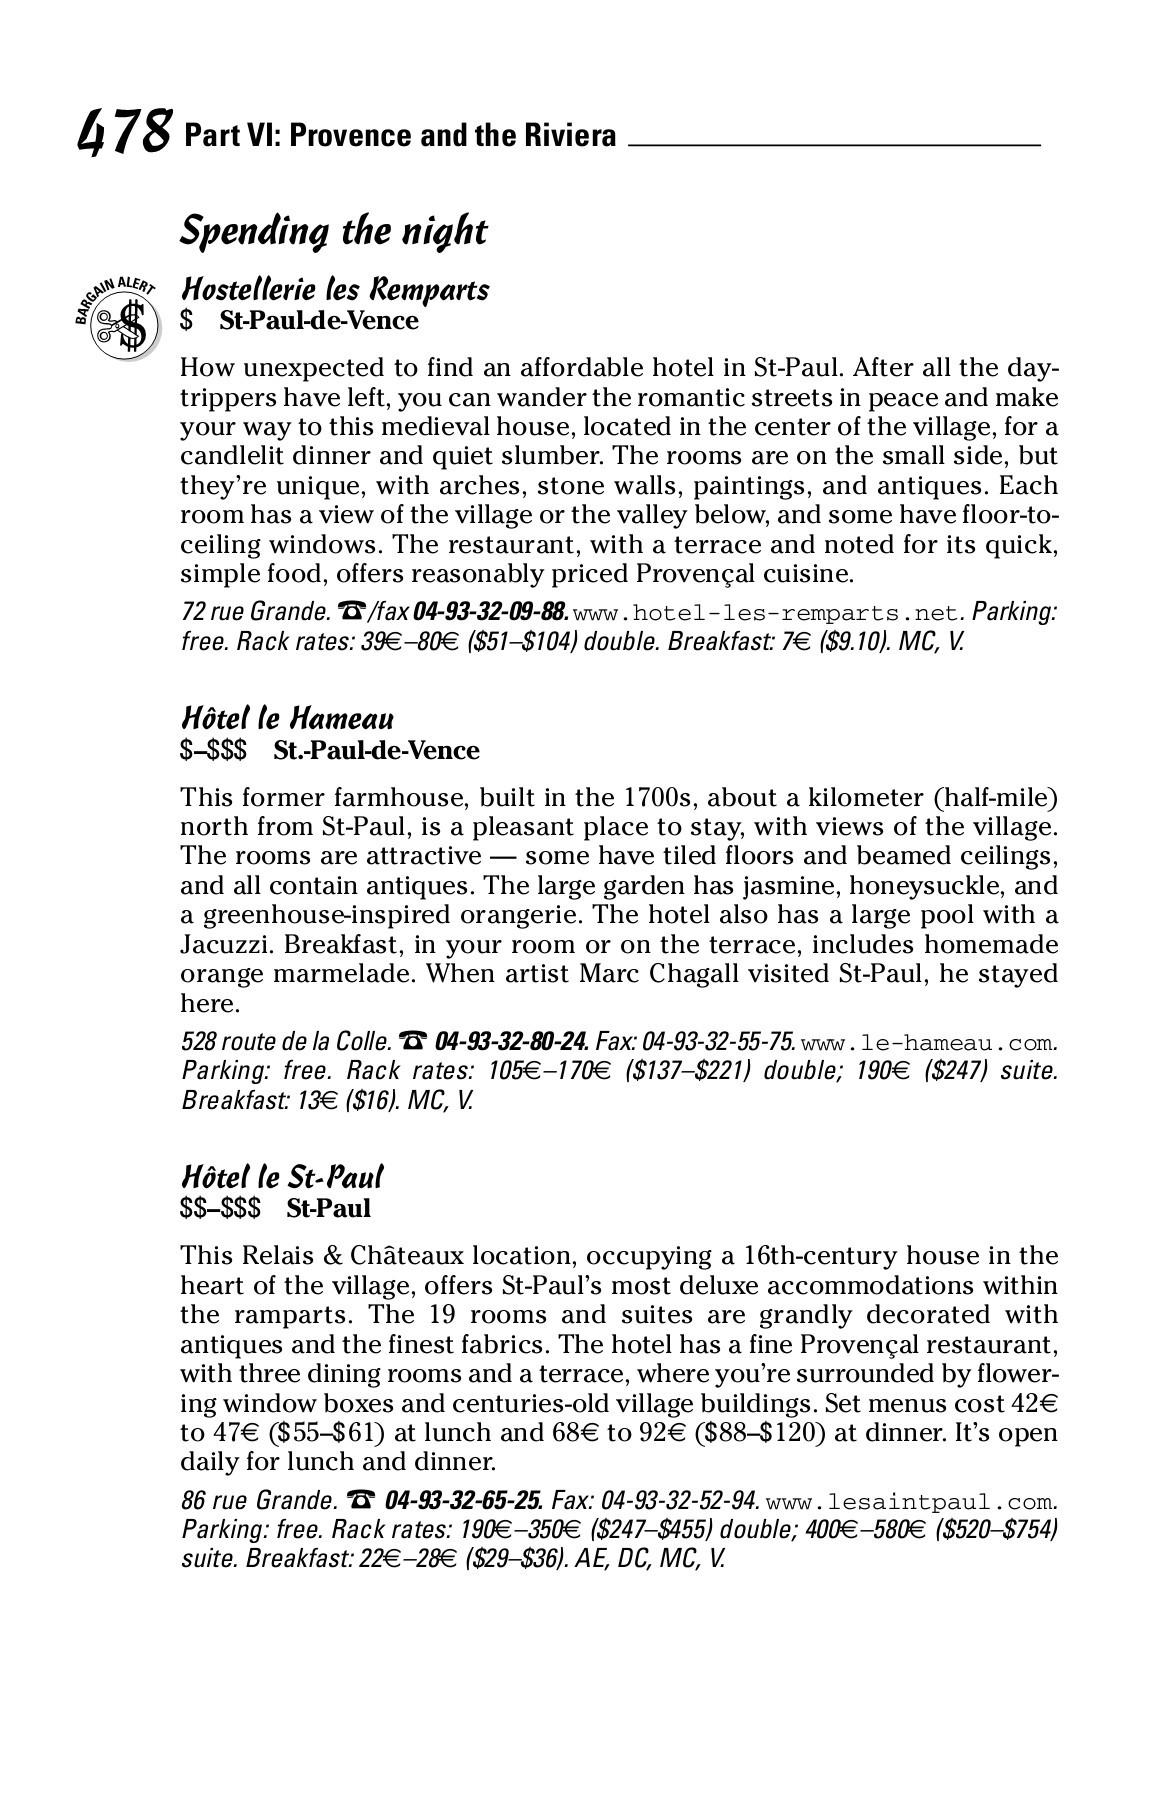 Verre Clair Saint Maximin france(isbn - 0470085819) pages 501 - 550 - text version